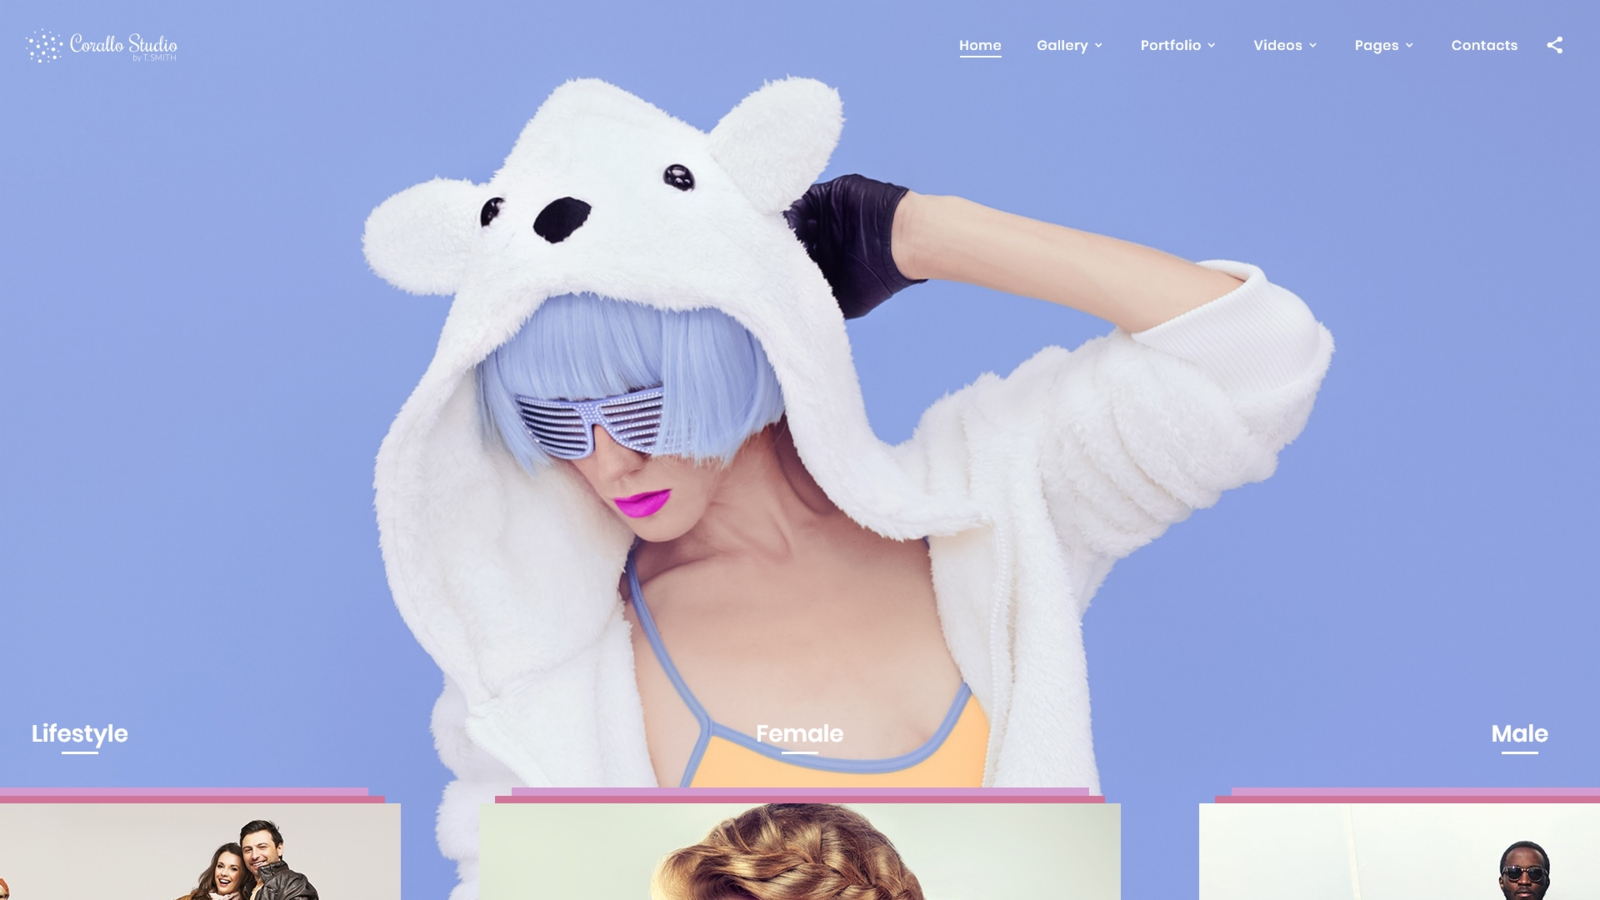 """Corallo Studio - Photographer Portfolio Multipage"" - адаптивний Шаблон сайту №68544"